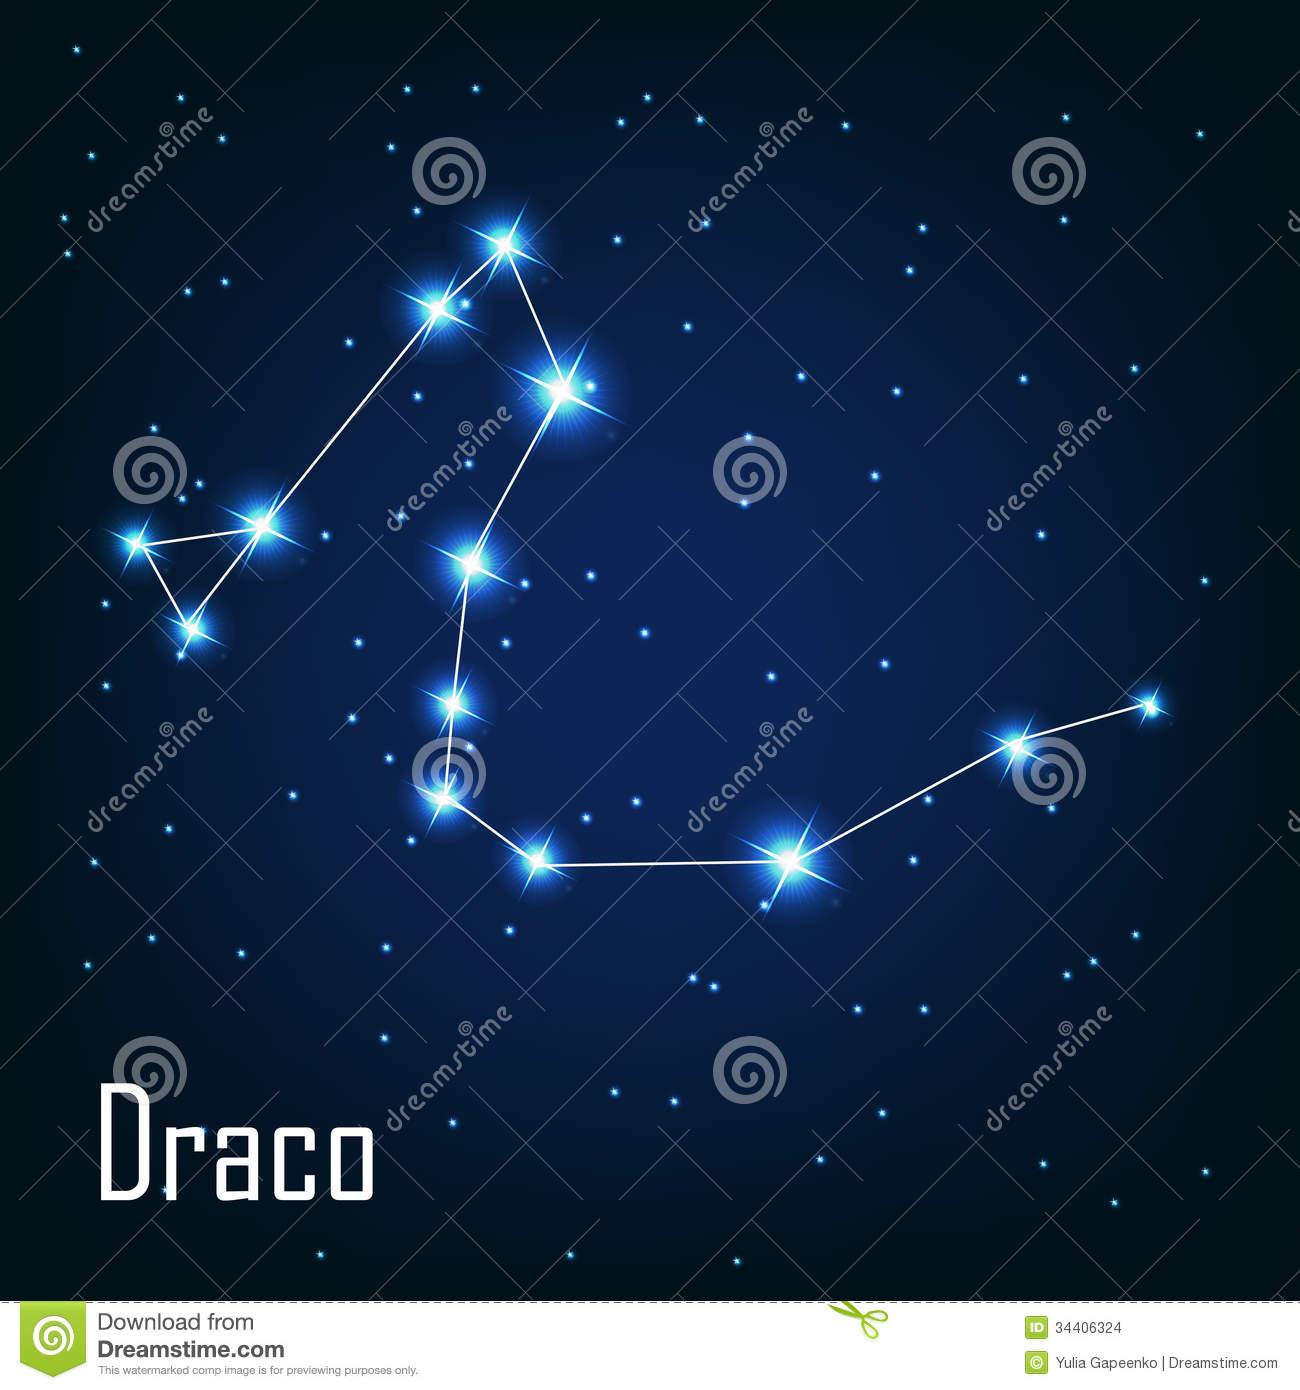 Draco Star Constellation Stock Vector.